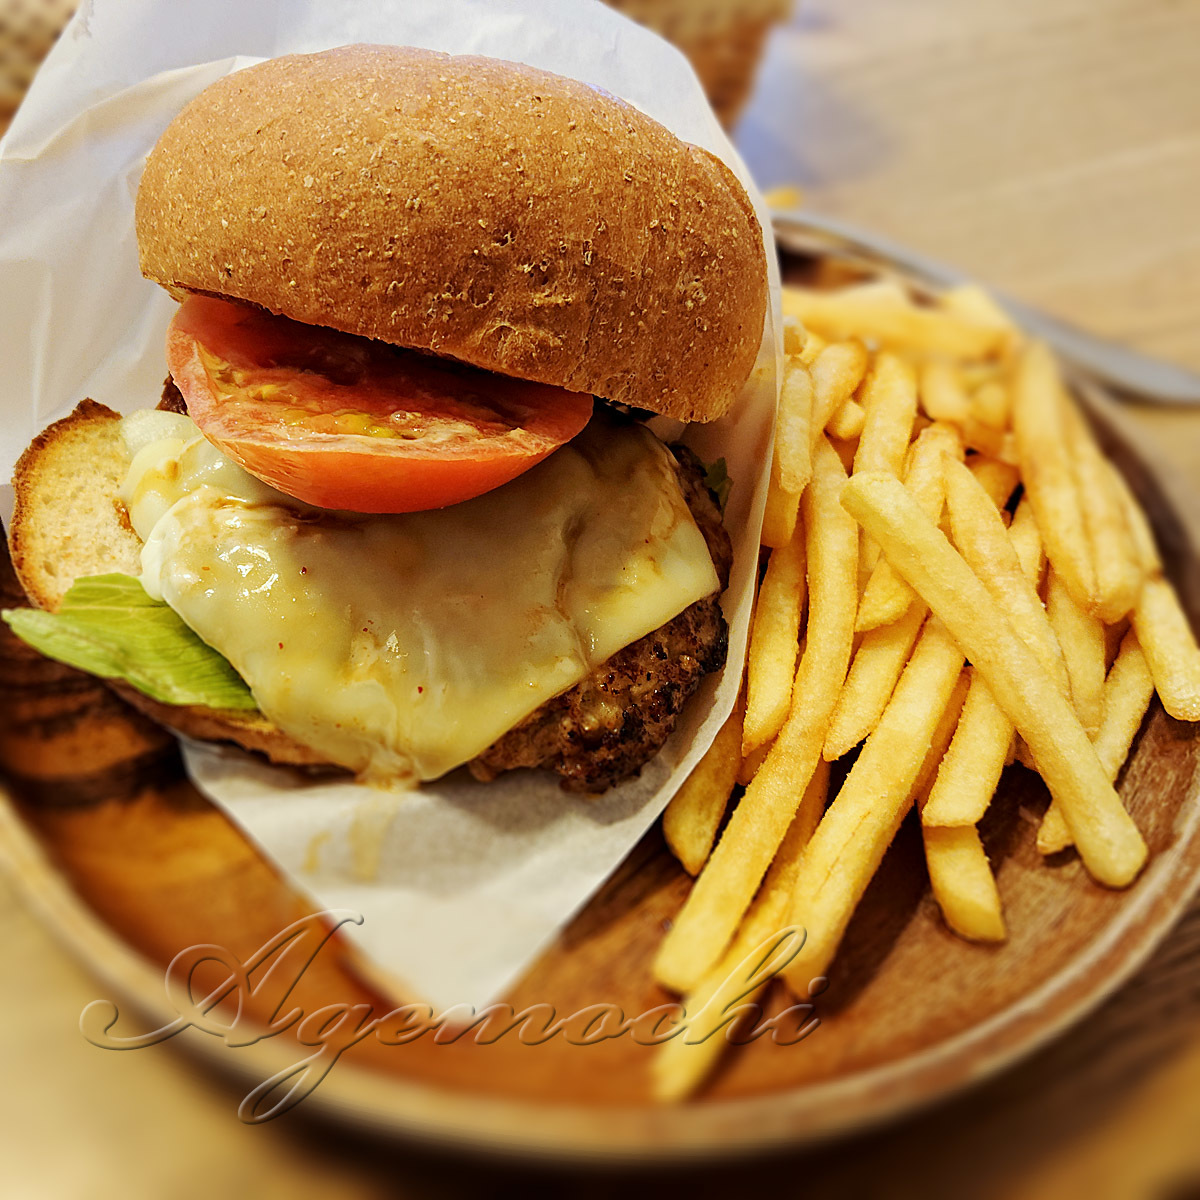 saboribar_cheeseburger0.jpg